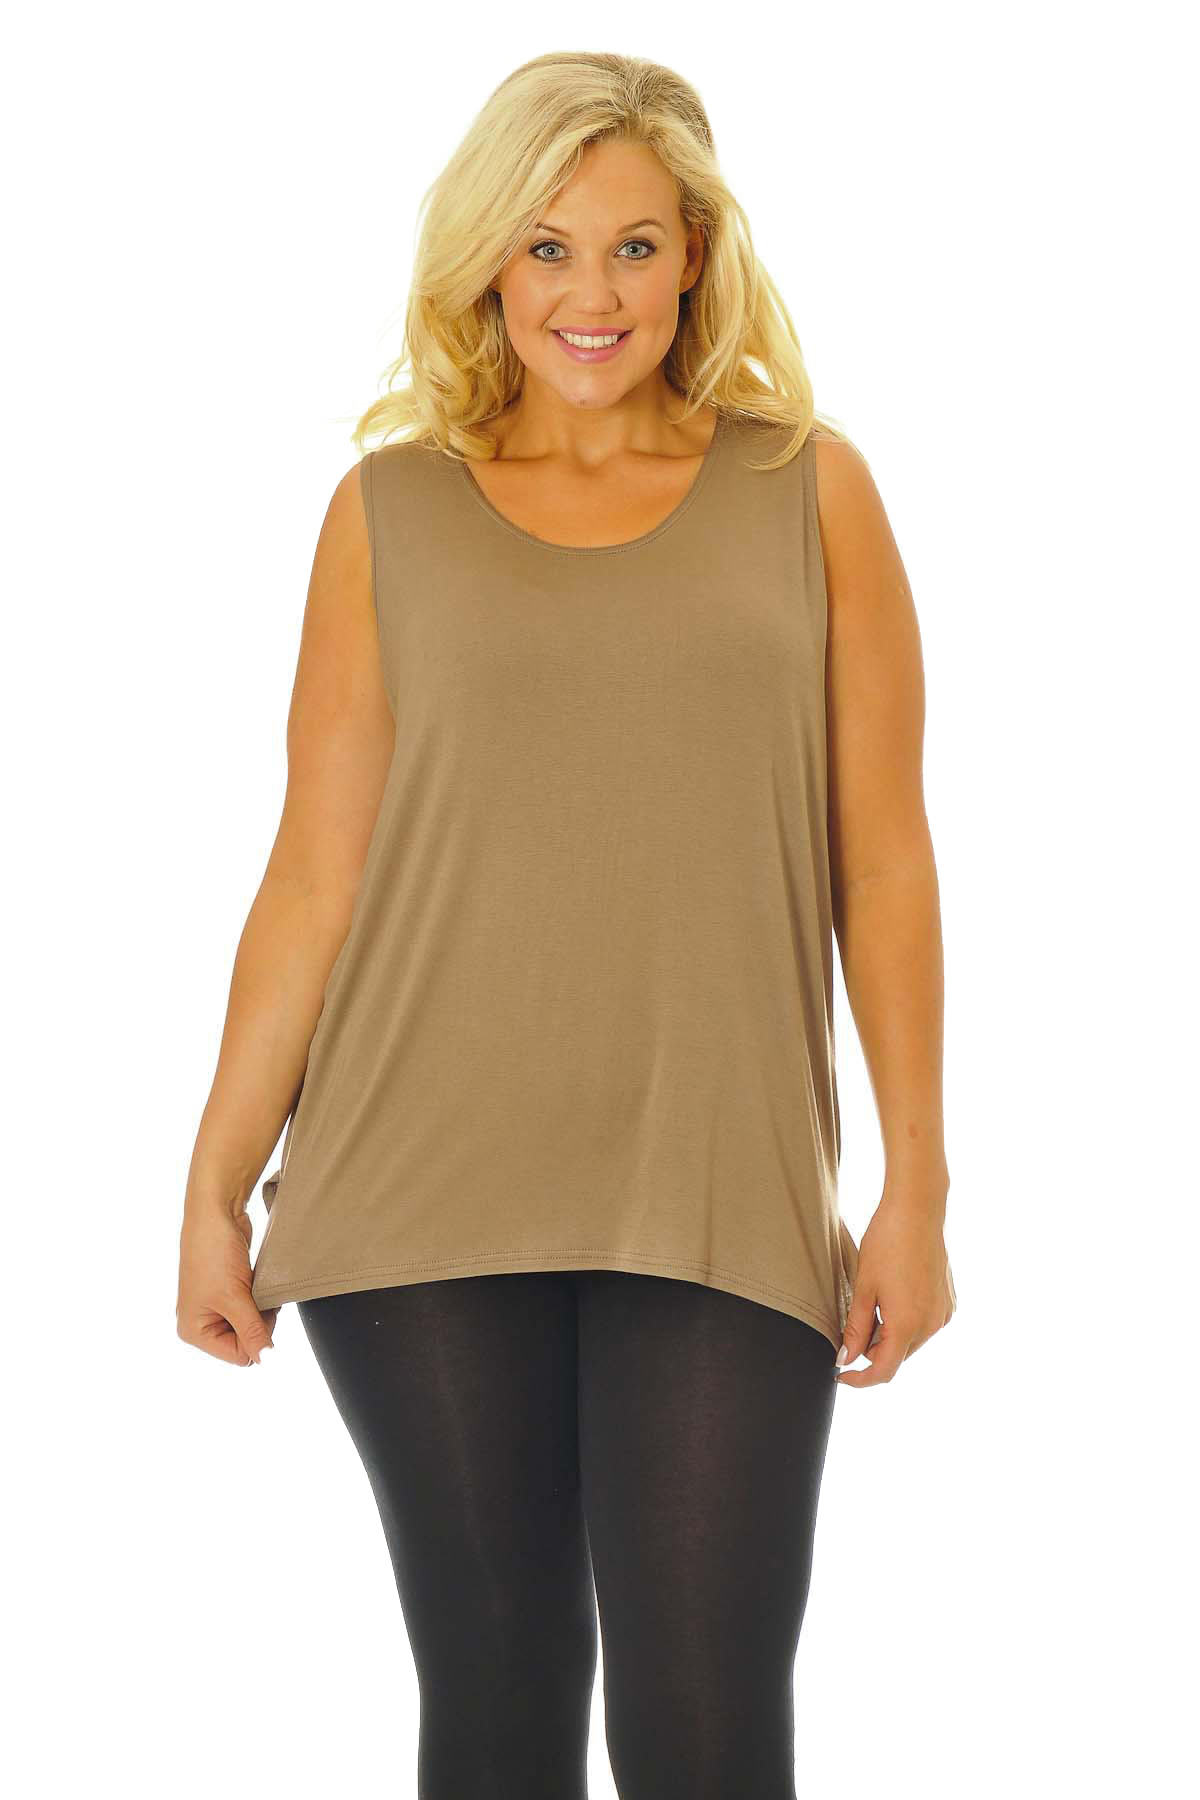 New Womens Plus Size Vest Ladies Plain Top Sleeveless ...